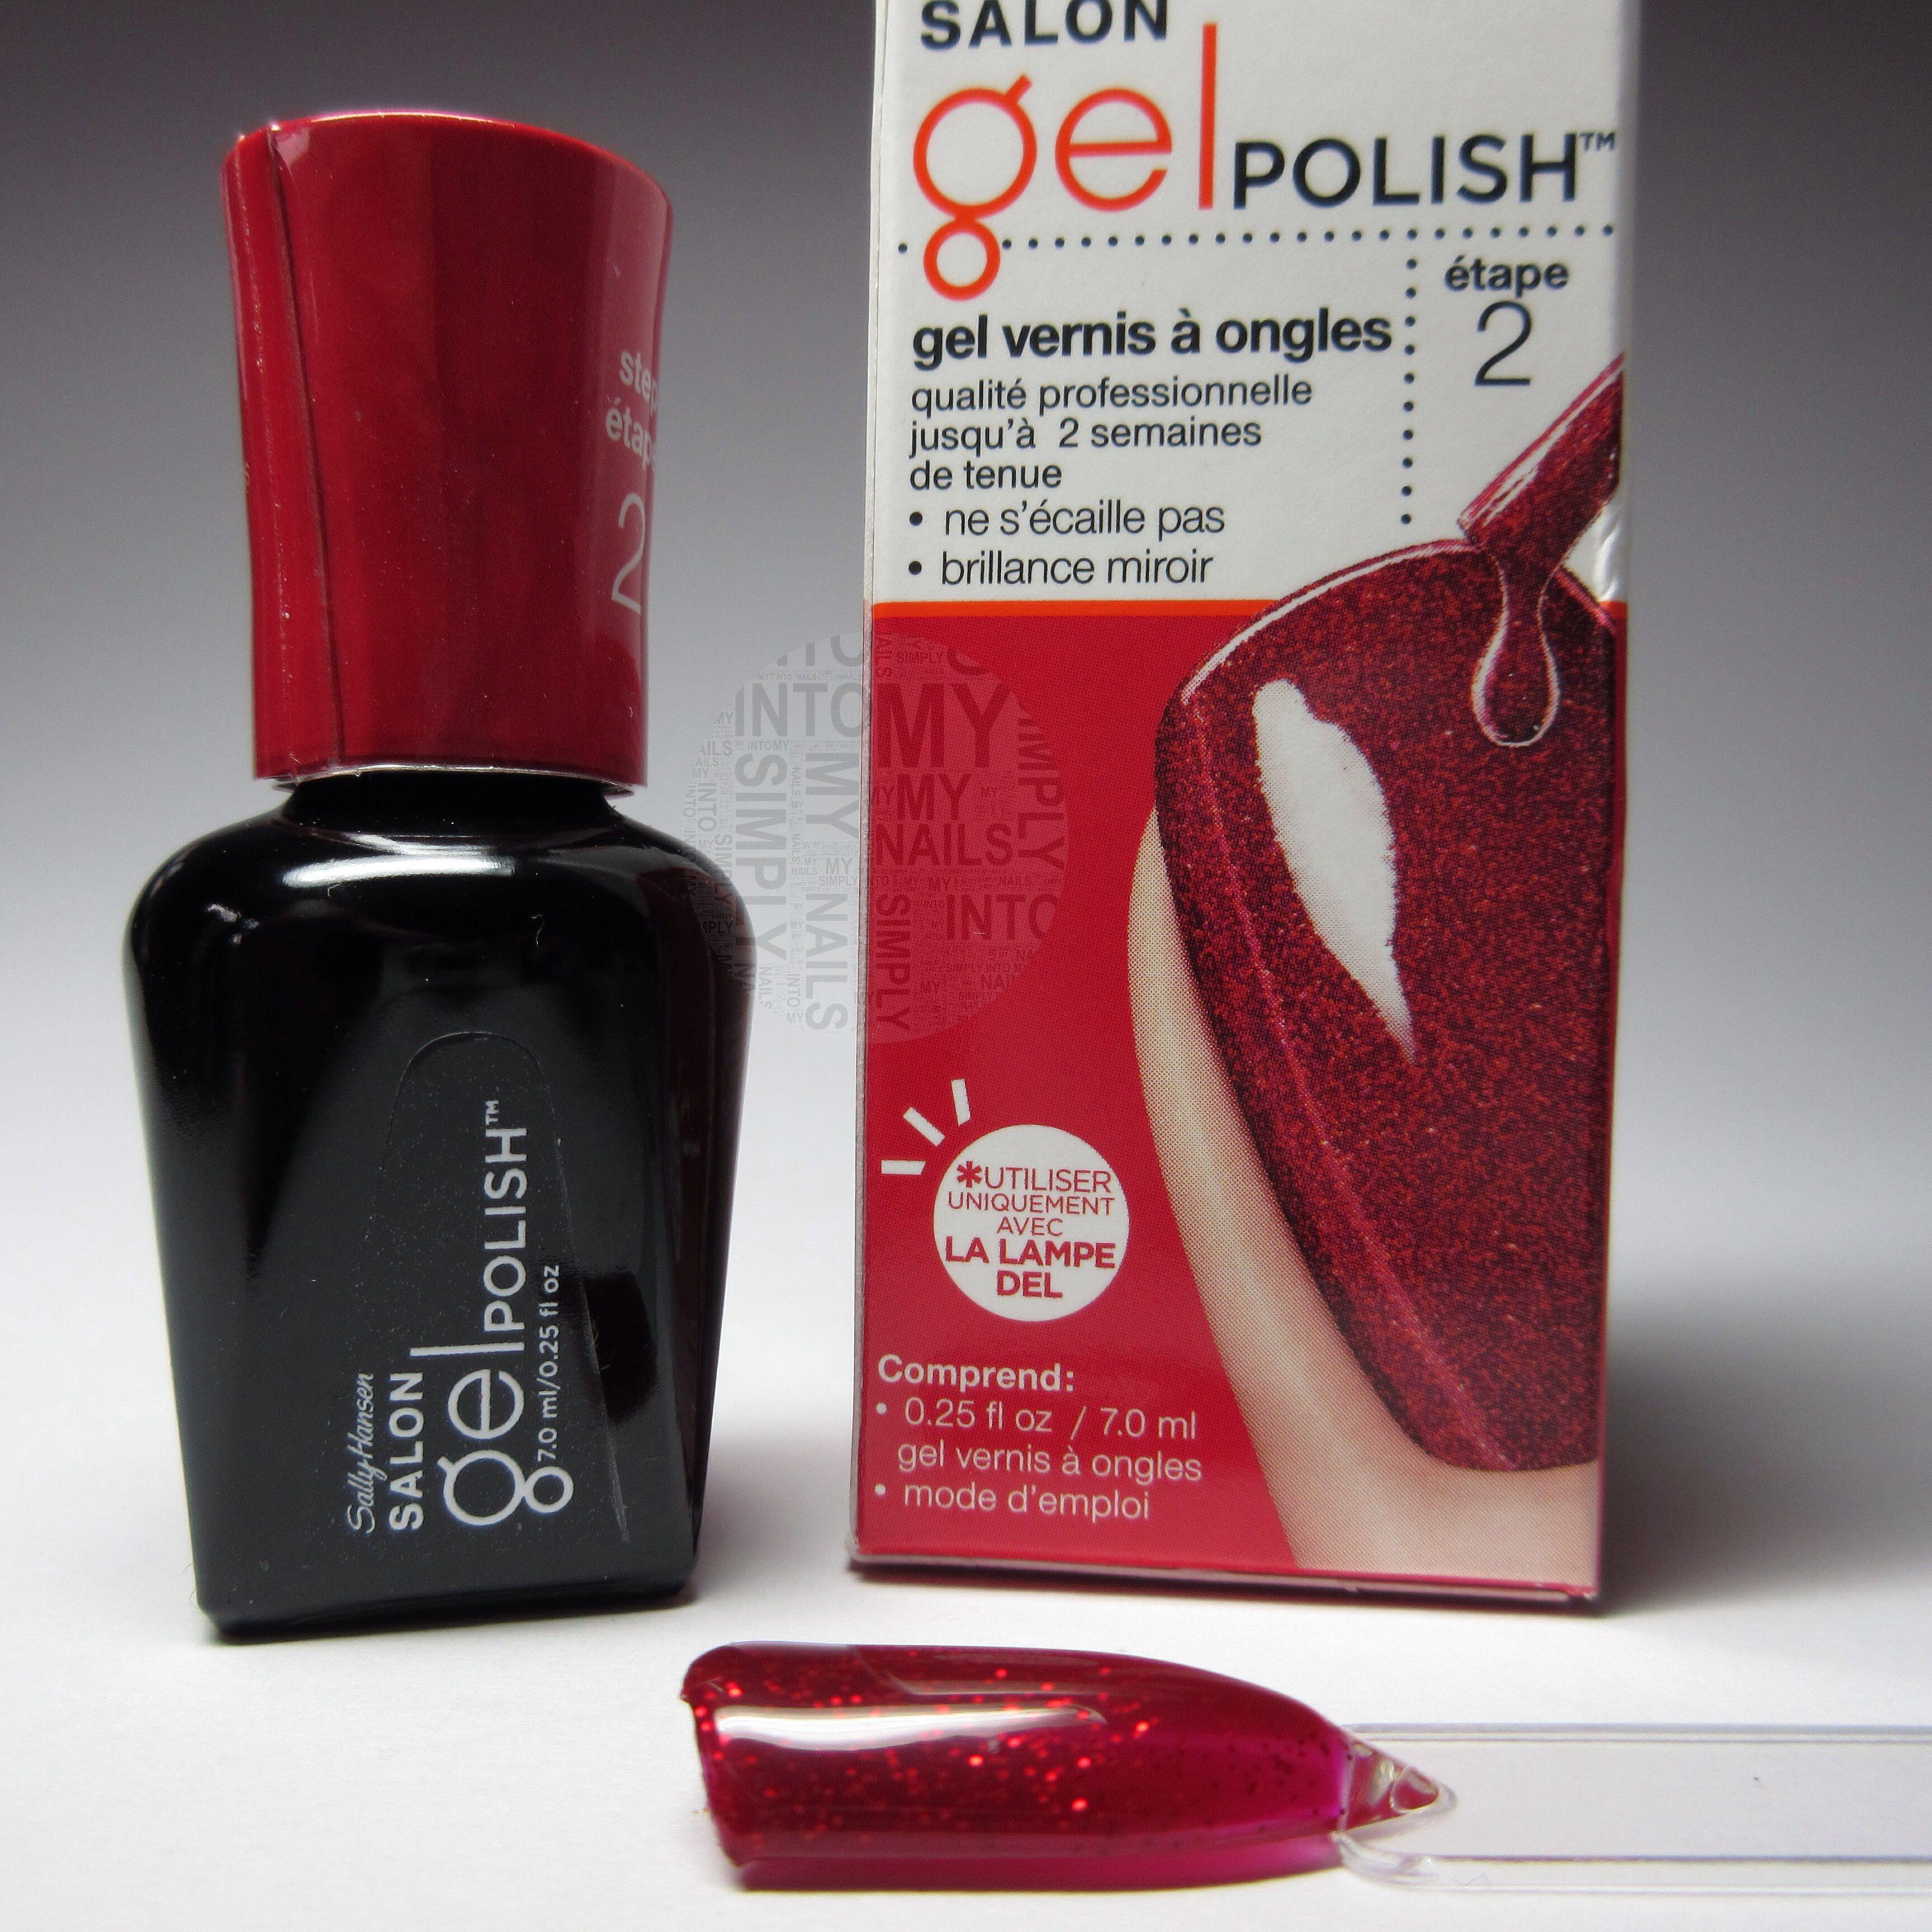 Red Haute Sally Hansen Salon Gel Polish Gel polish